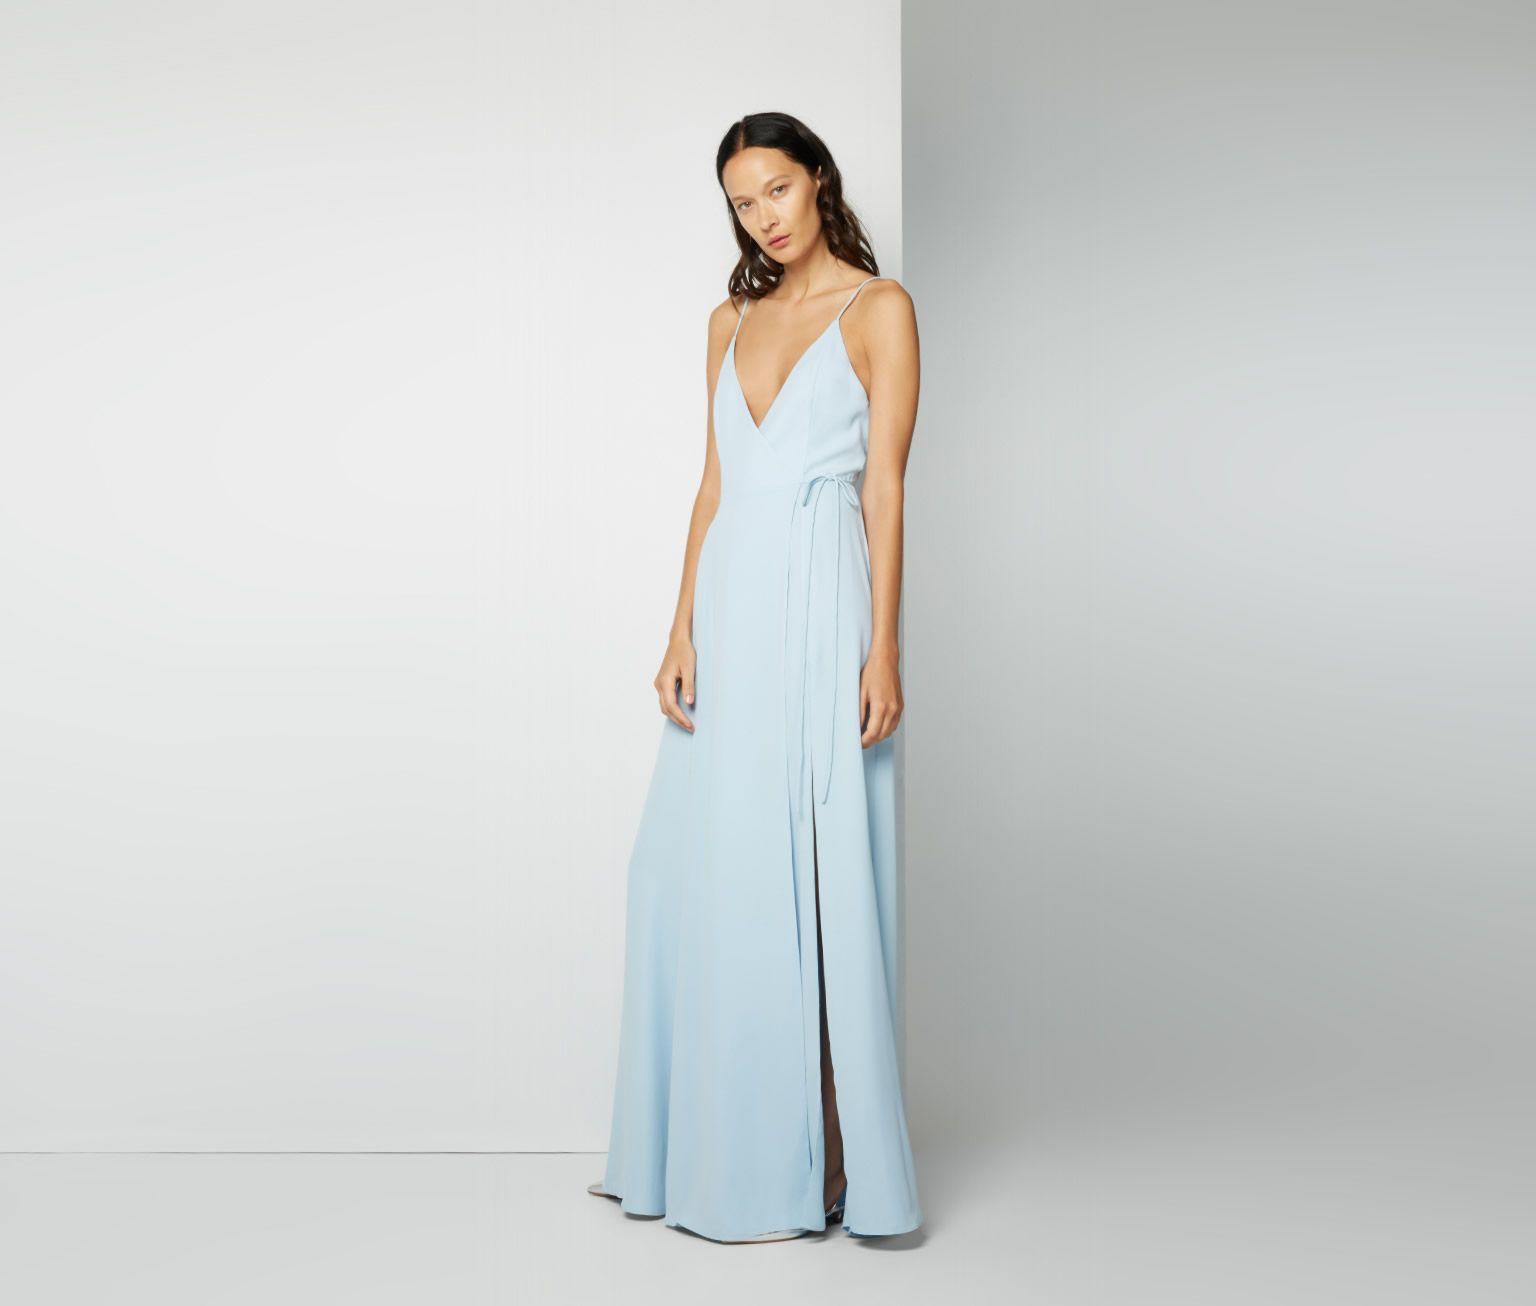 Tilbury Dress | Pinterest | Tilbury, Dresses dresses and Prom